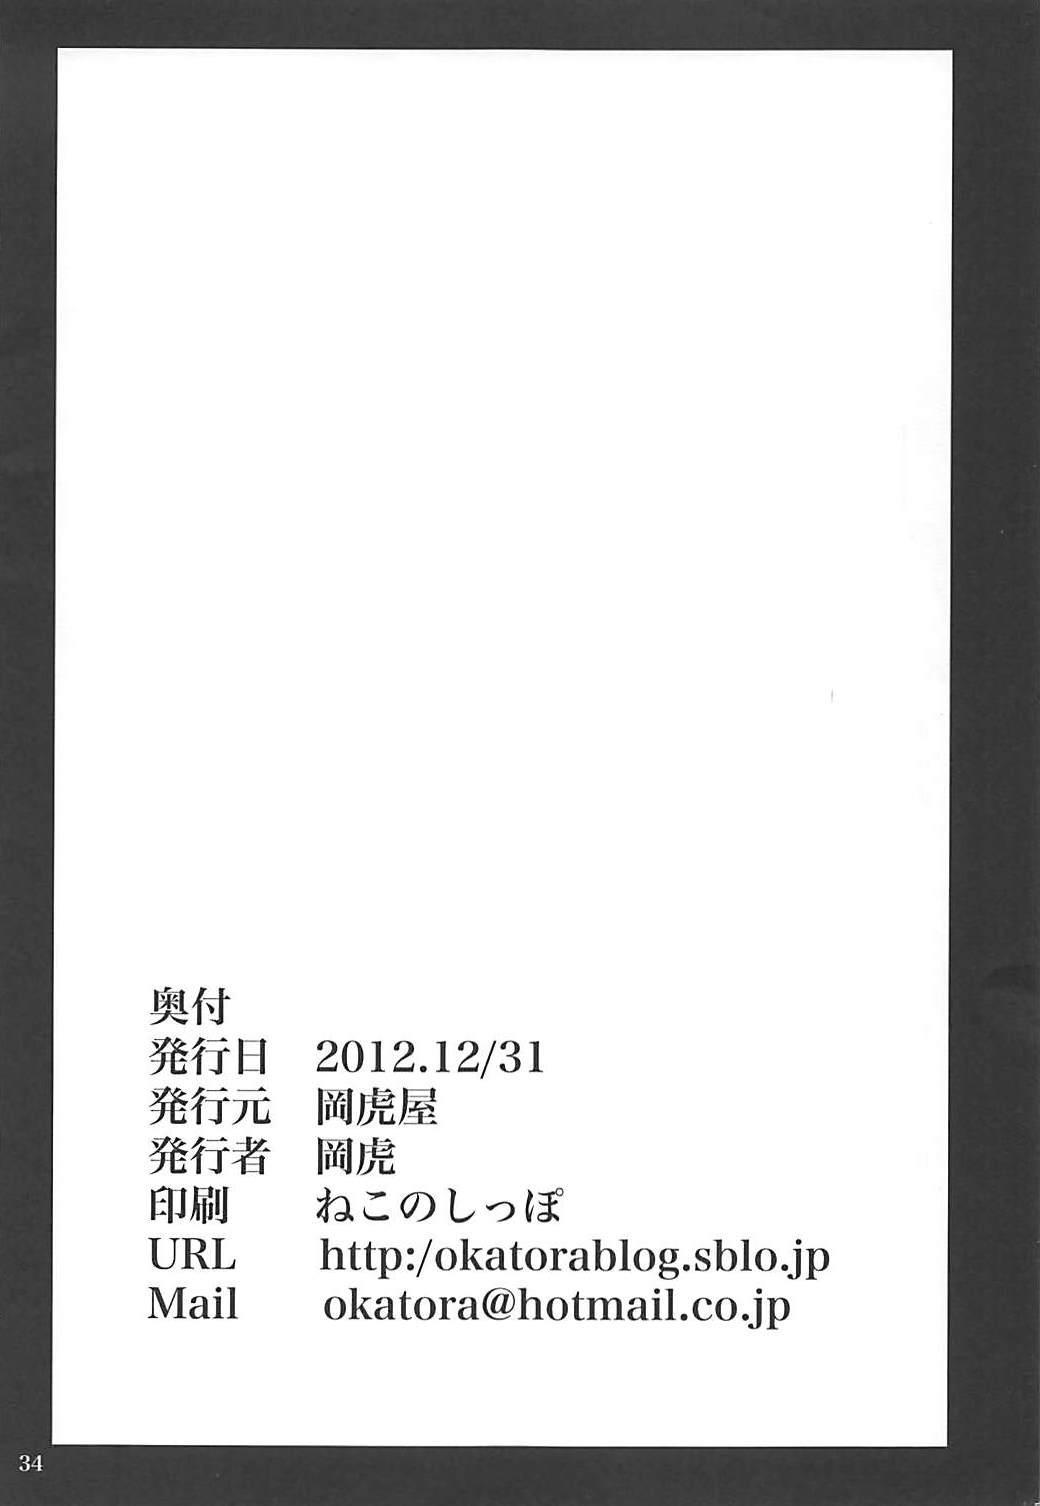 Suguha Route Kocchi to Acchi de Love Icha x 2 32